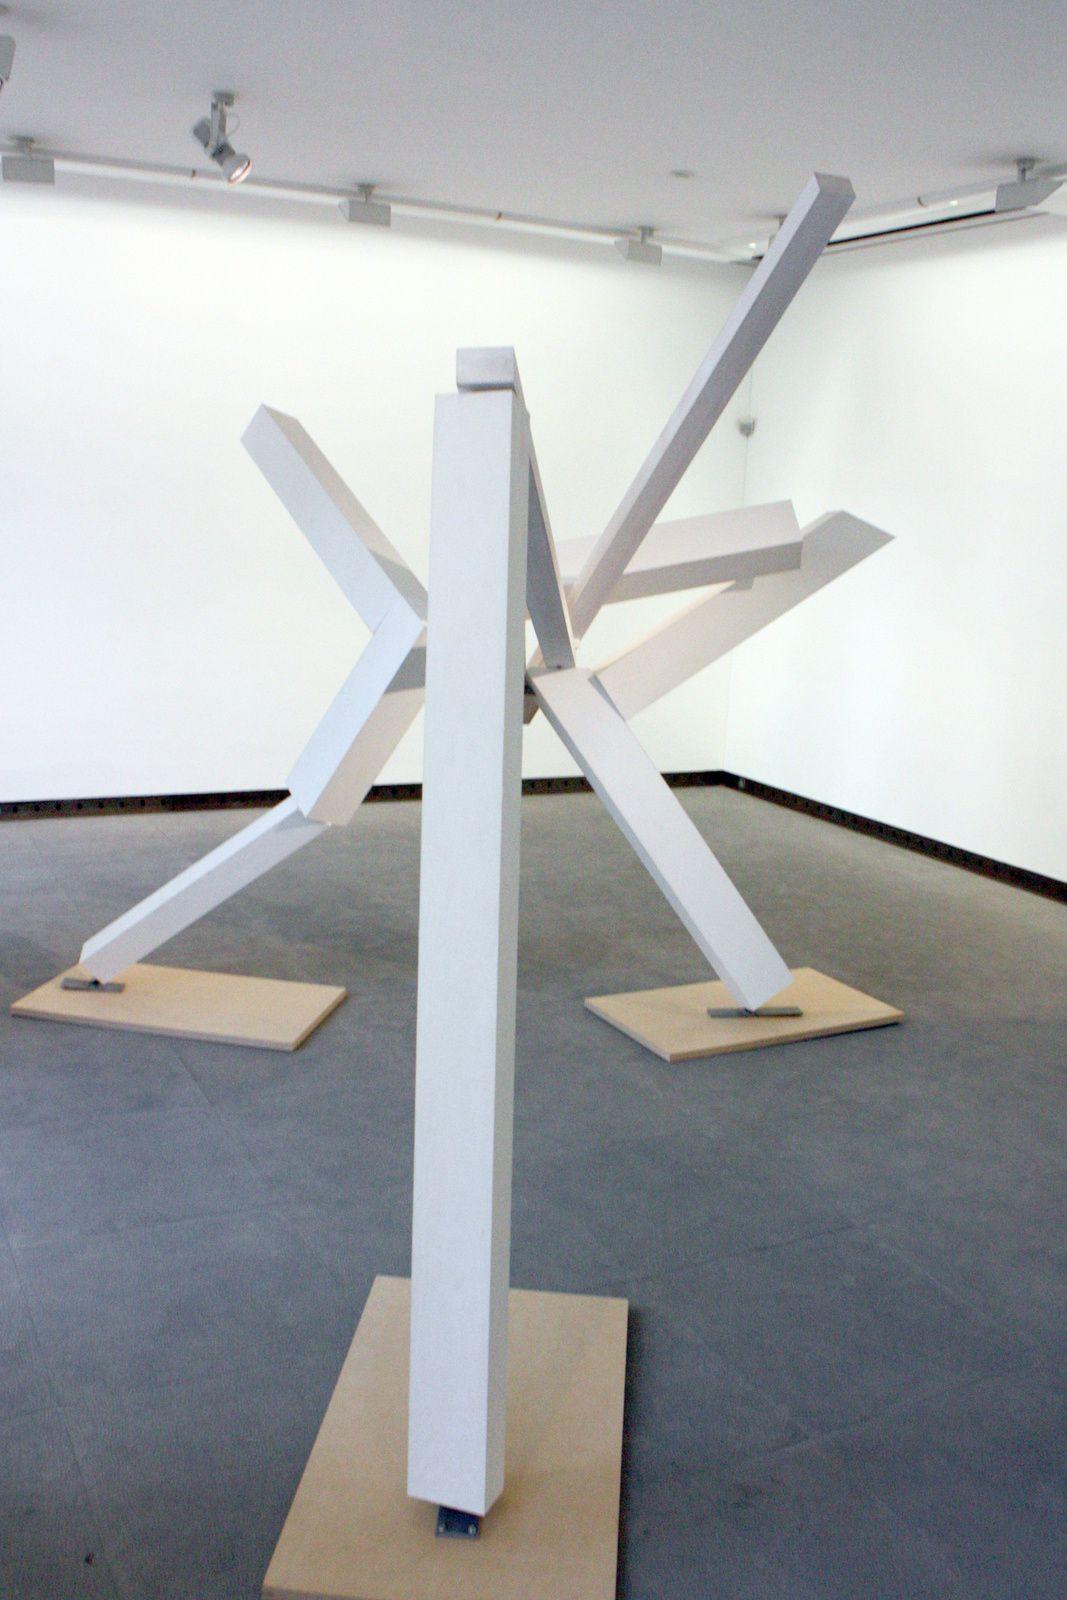 """Sans titre"", 2003-2005 de Joël SHAPIRO Courtesy Galerie Karsten Greve Paris"